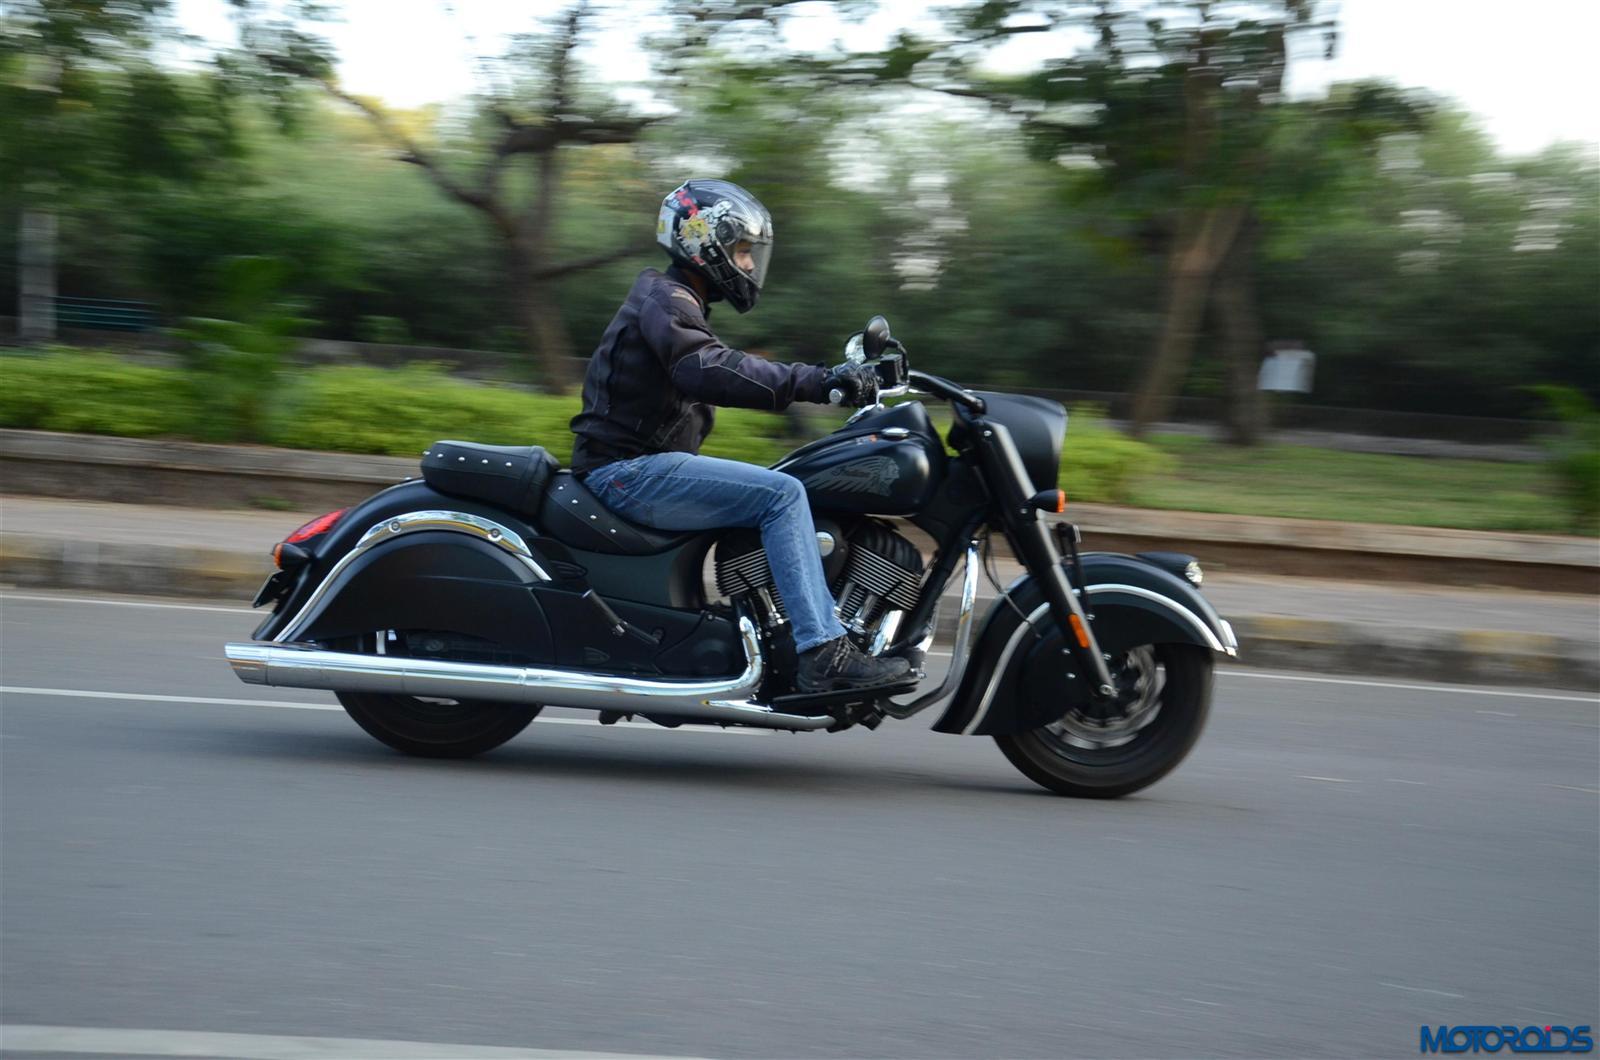 Indian Dark Horse riding comfort